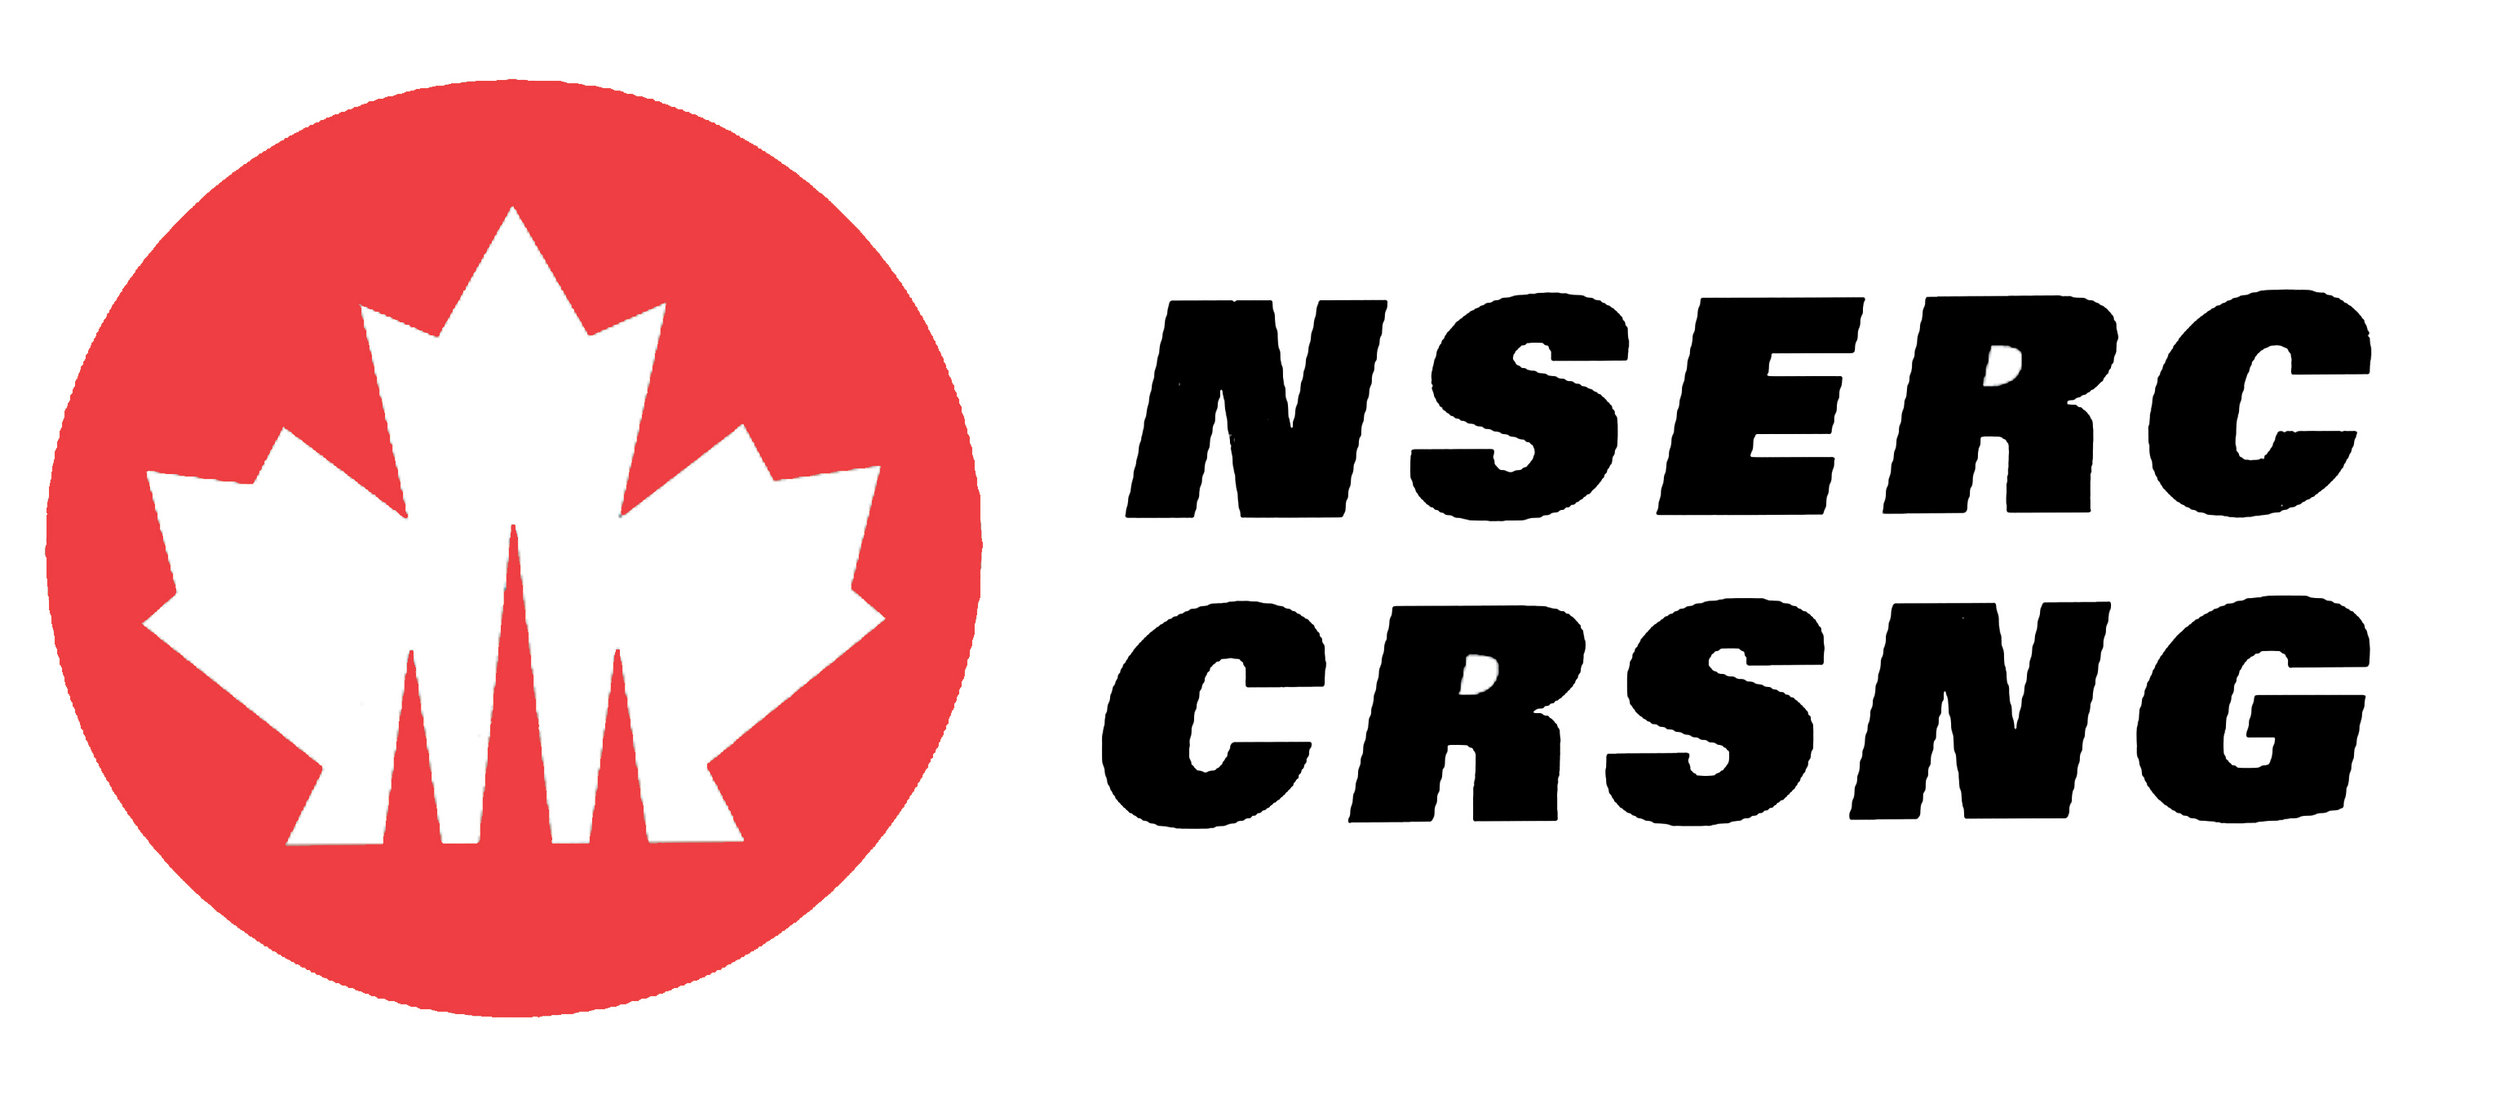 nserc_crsng_high.jpg